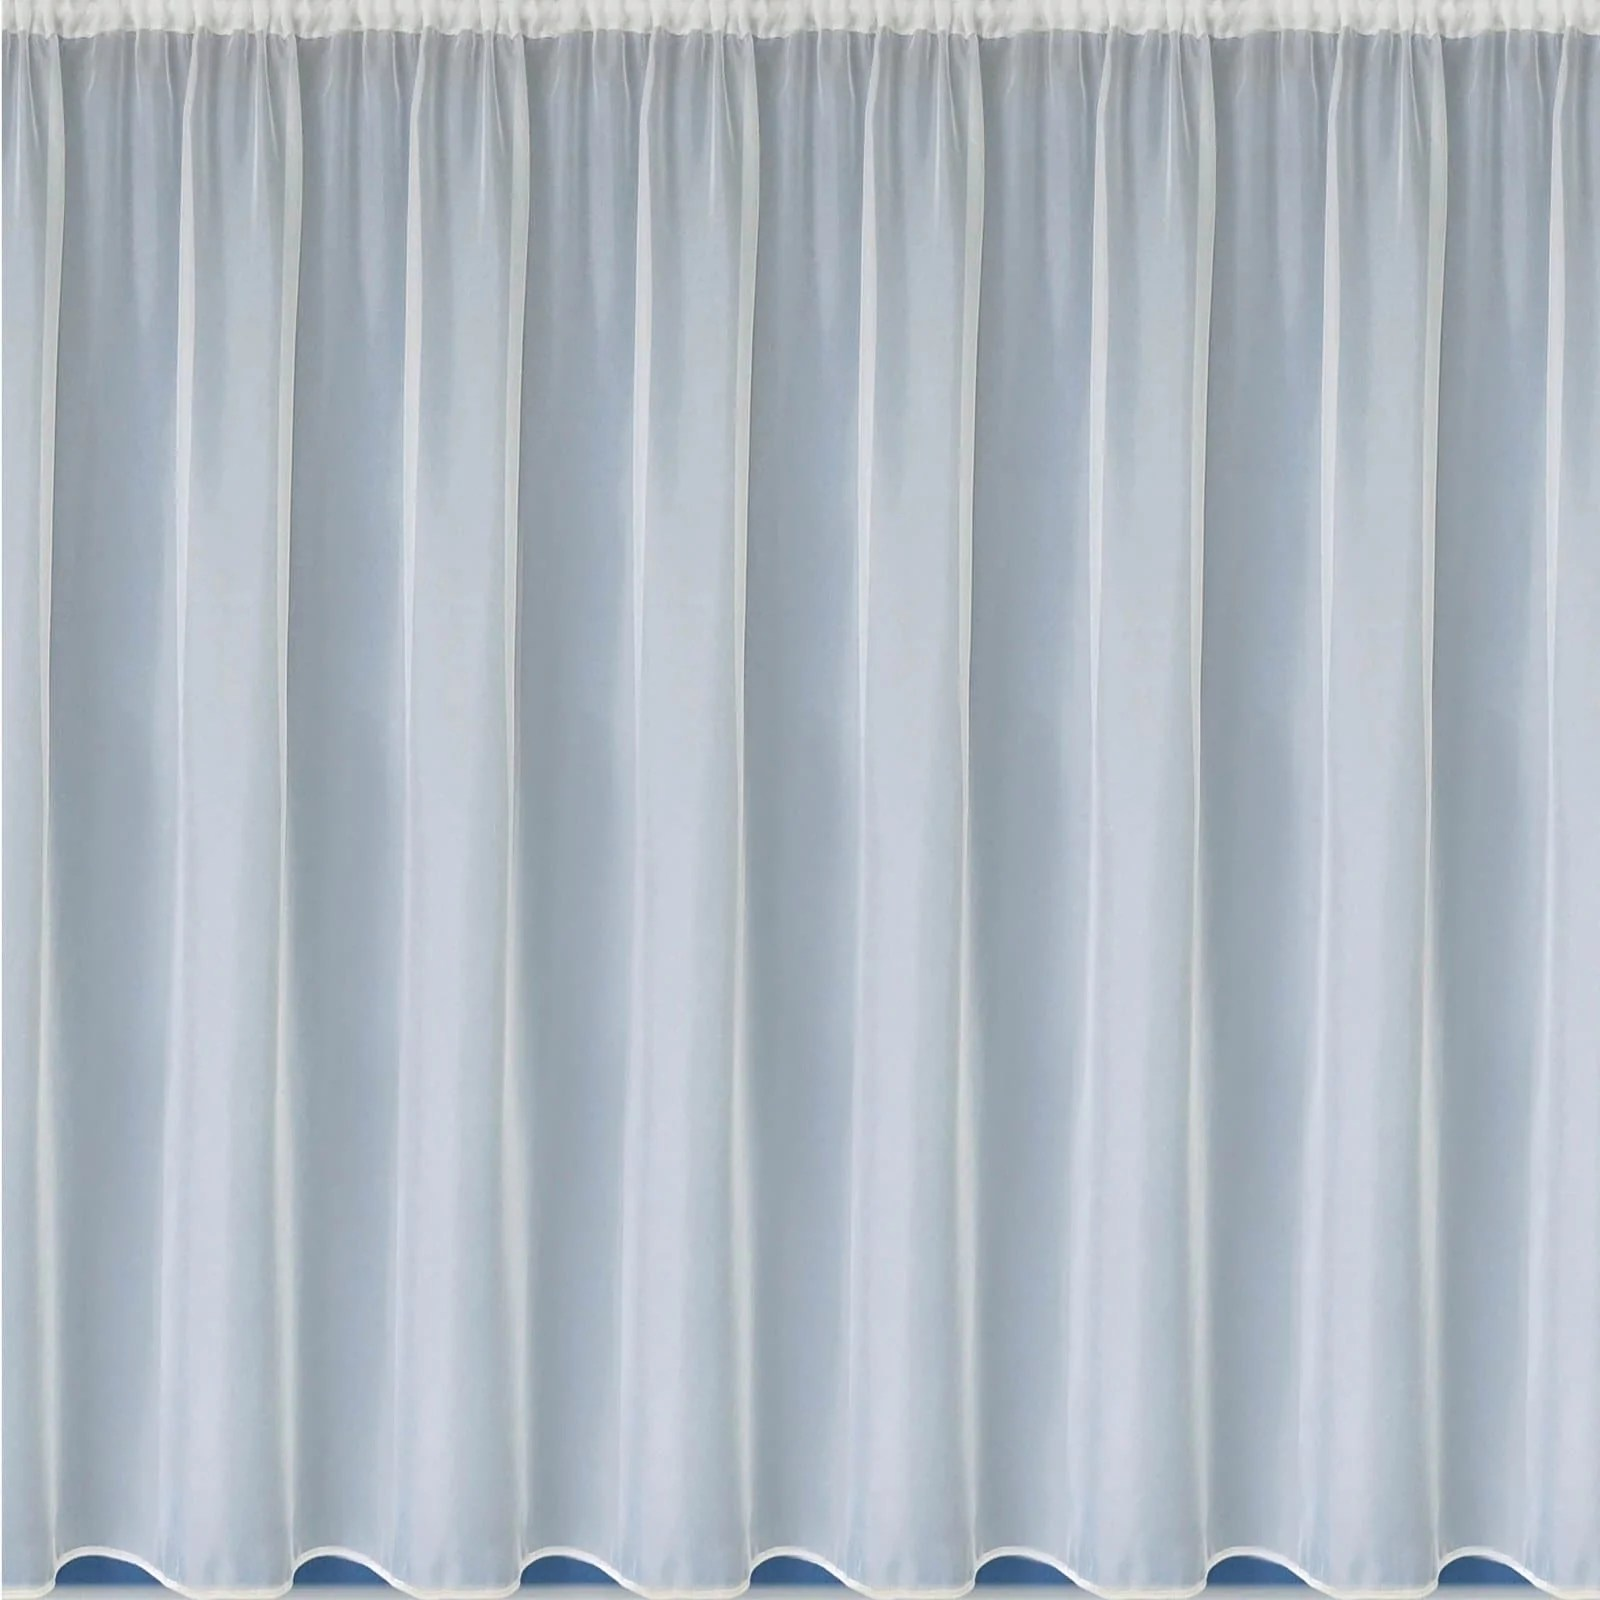 albany white pre cut white net curtain panels